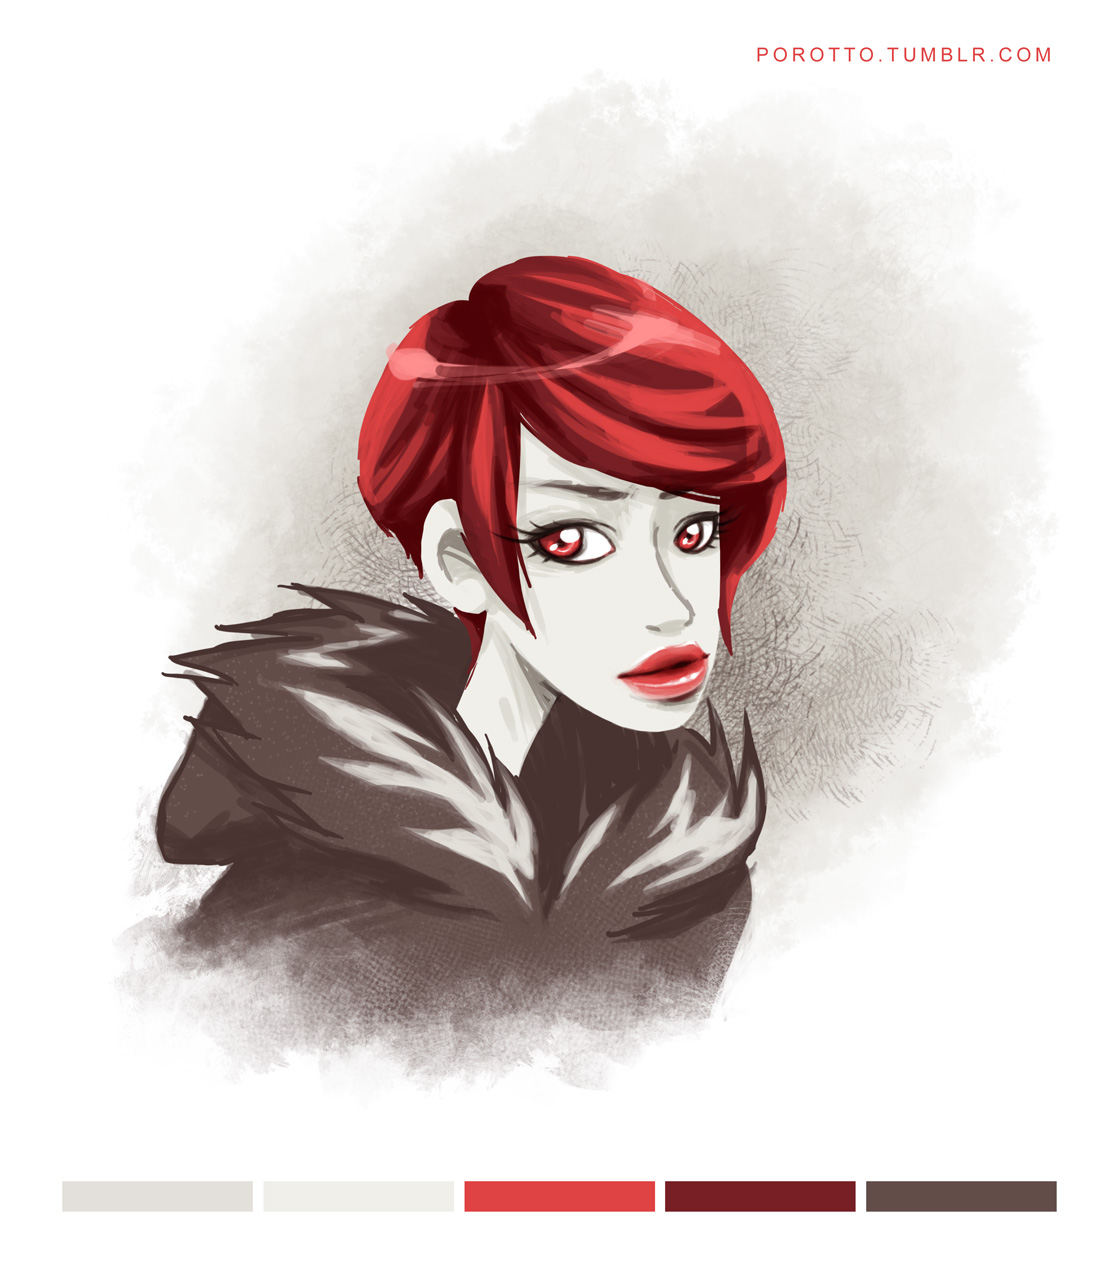 redhead by porotto